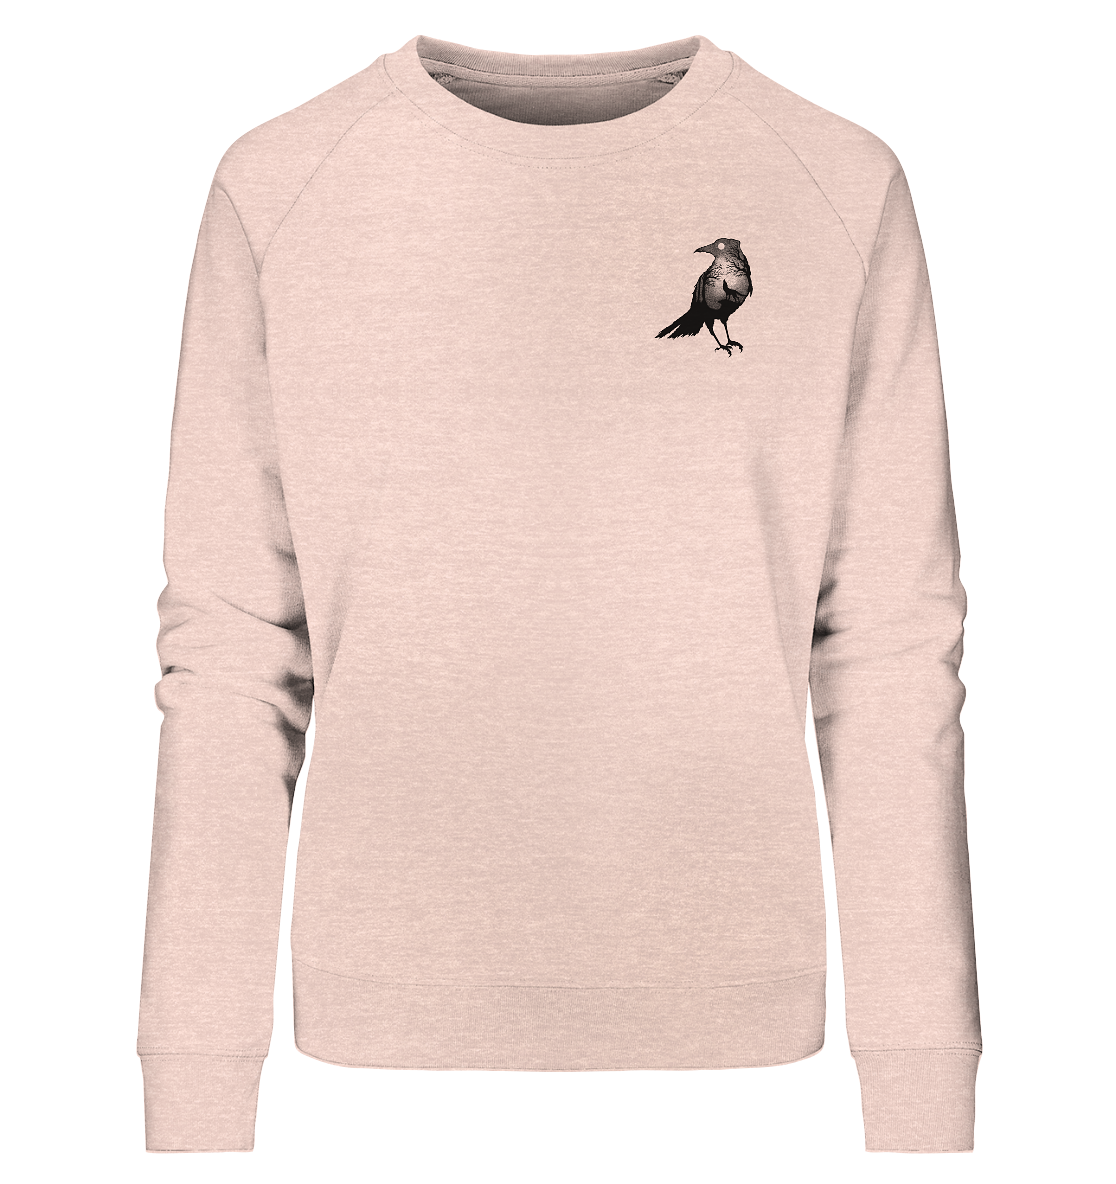 front-ladies-organic-sweatshirt-ffded6-1116x-5.png